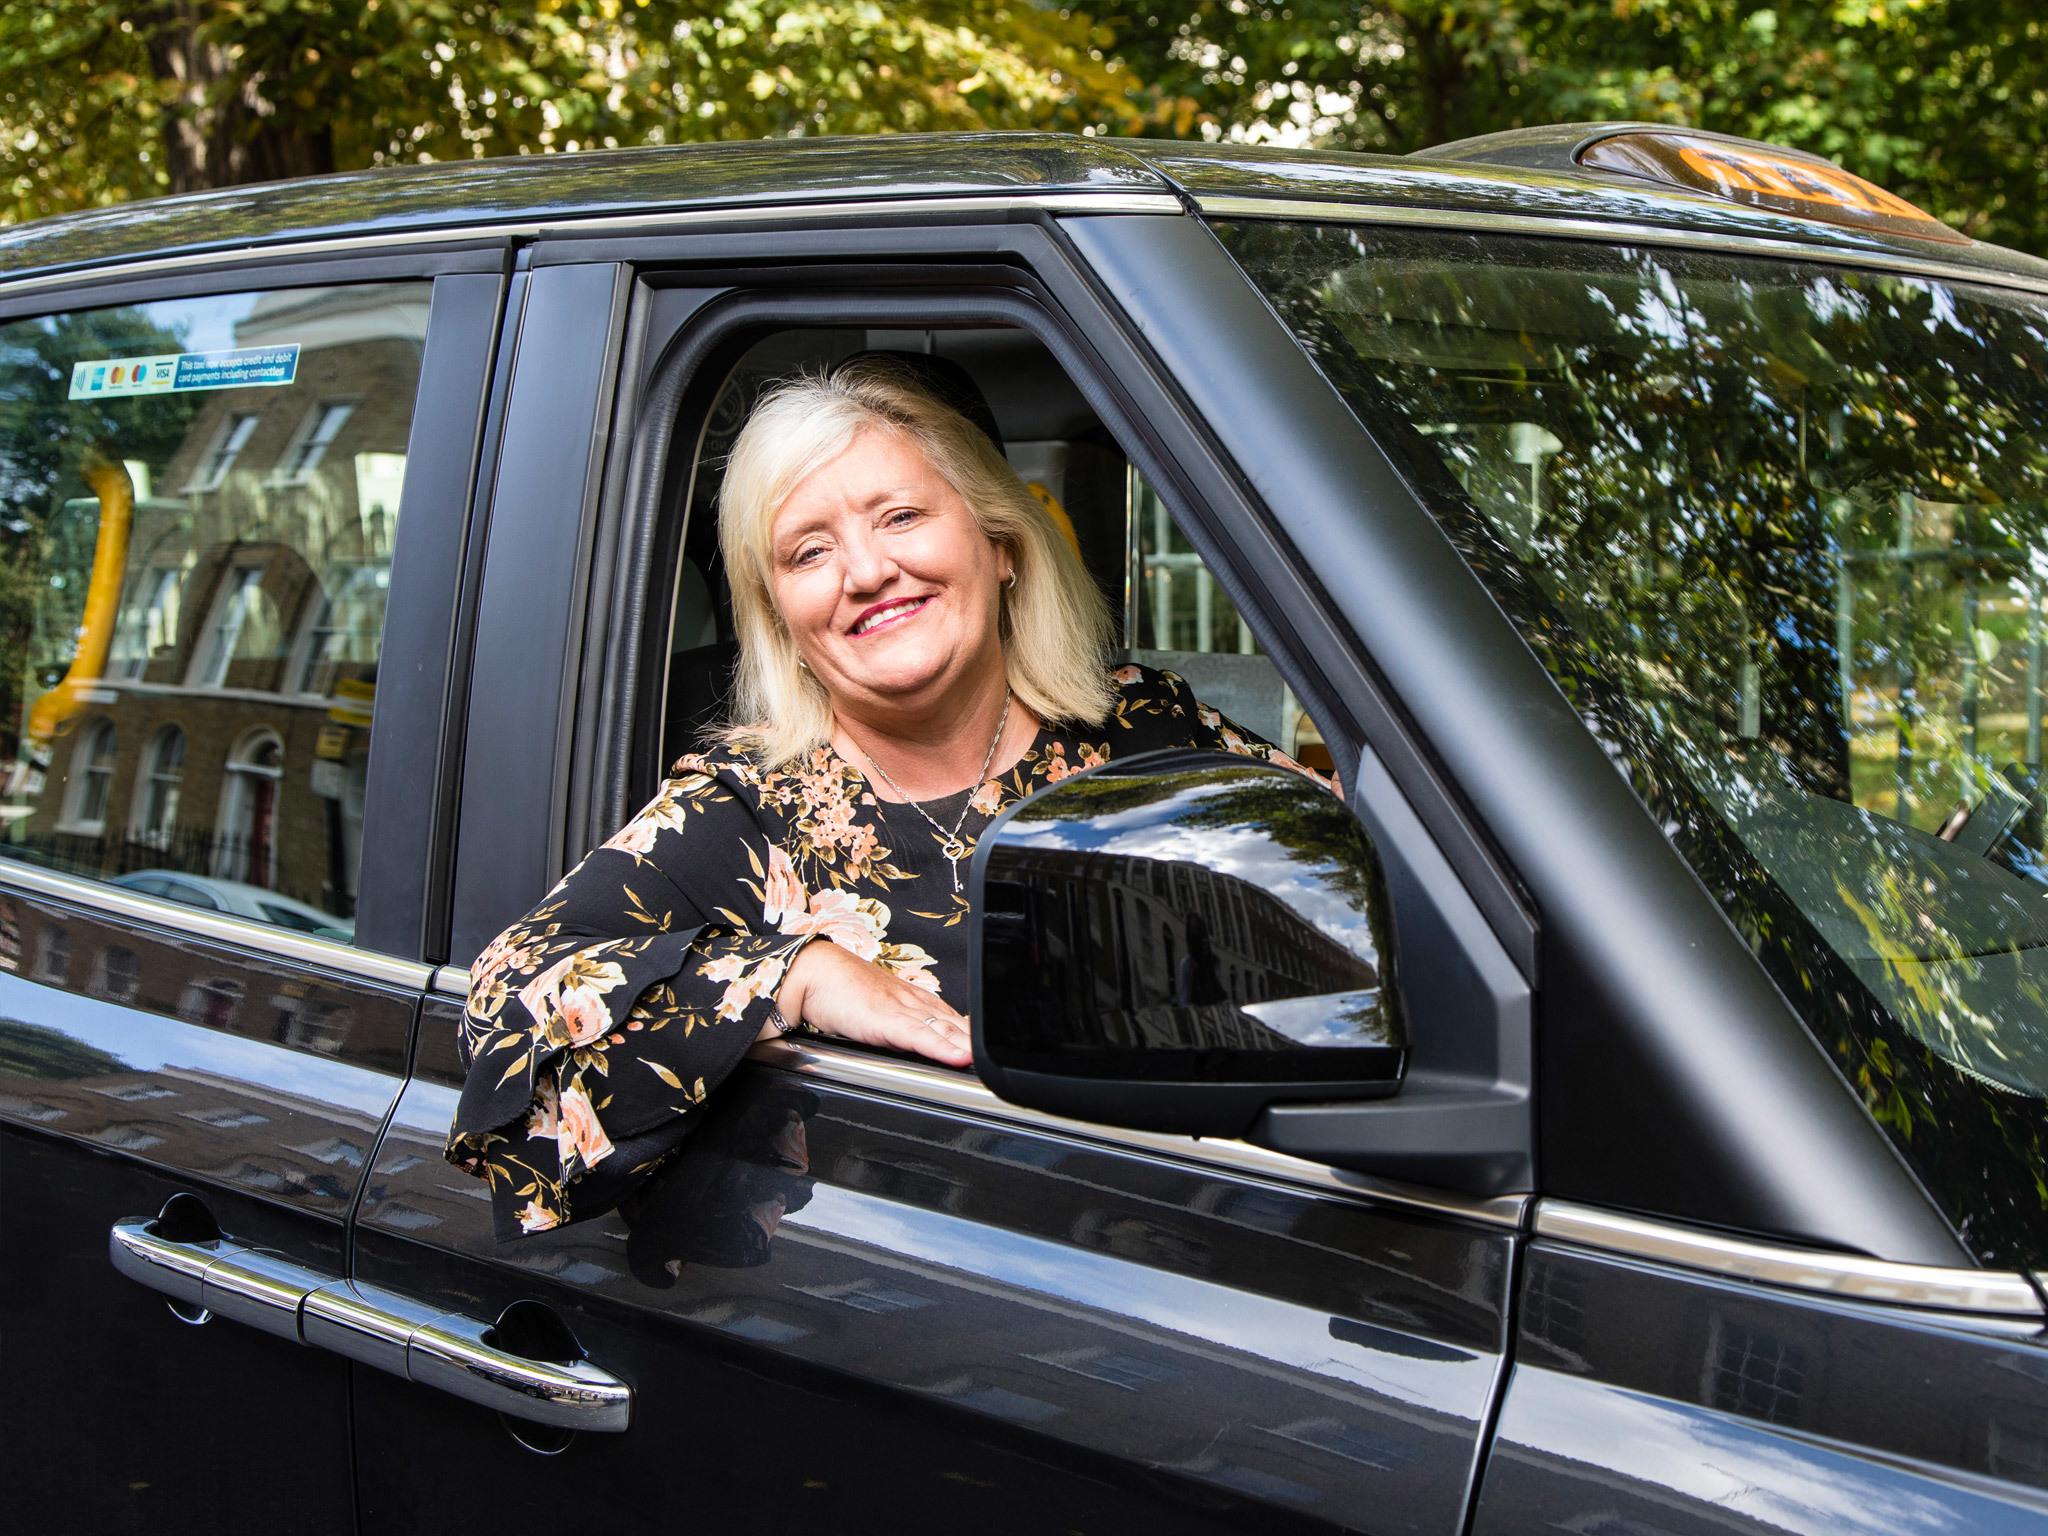 Meet one of London's few female black cab drivers